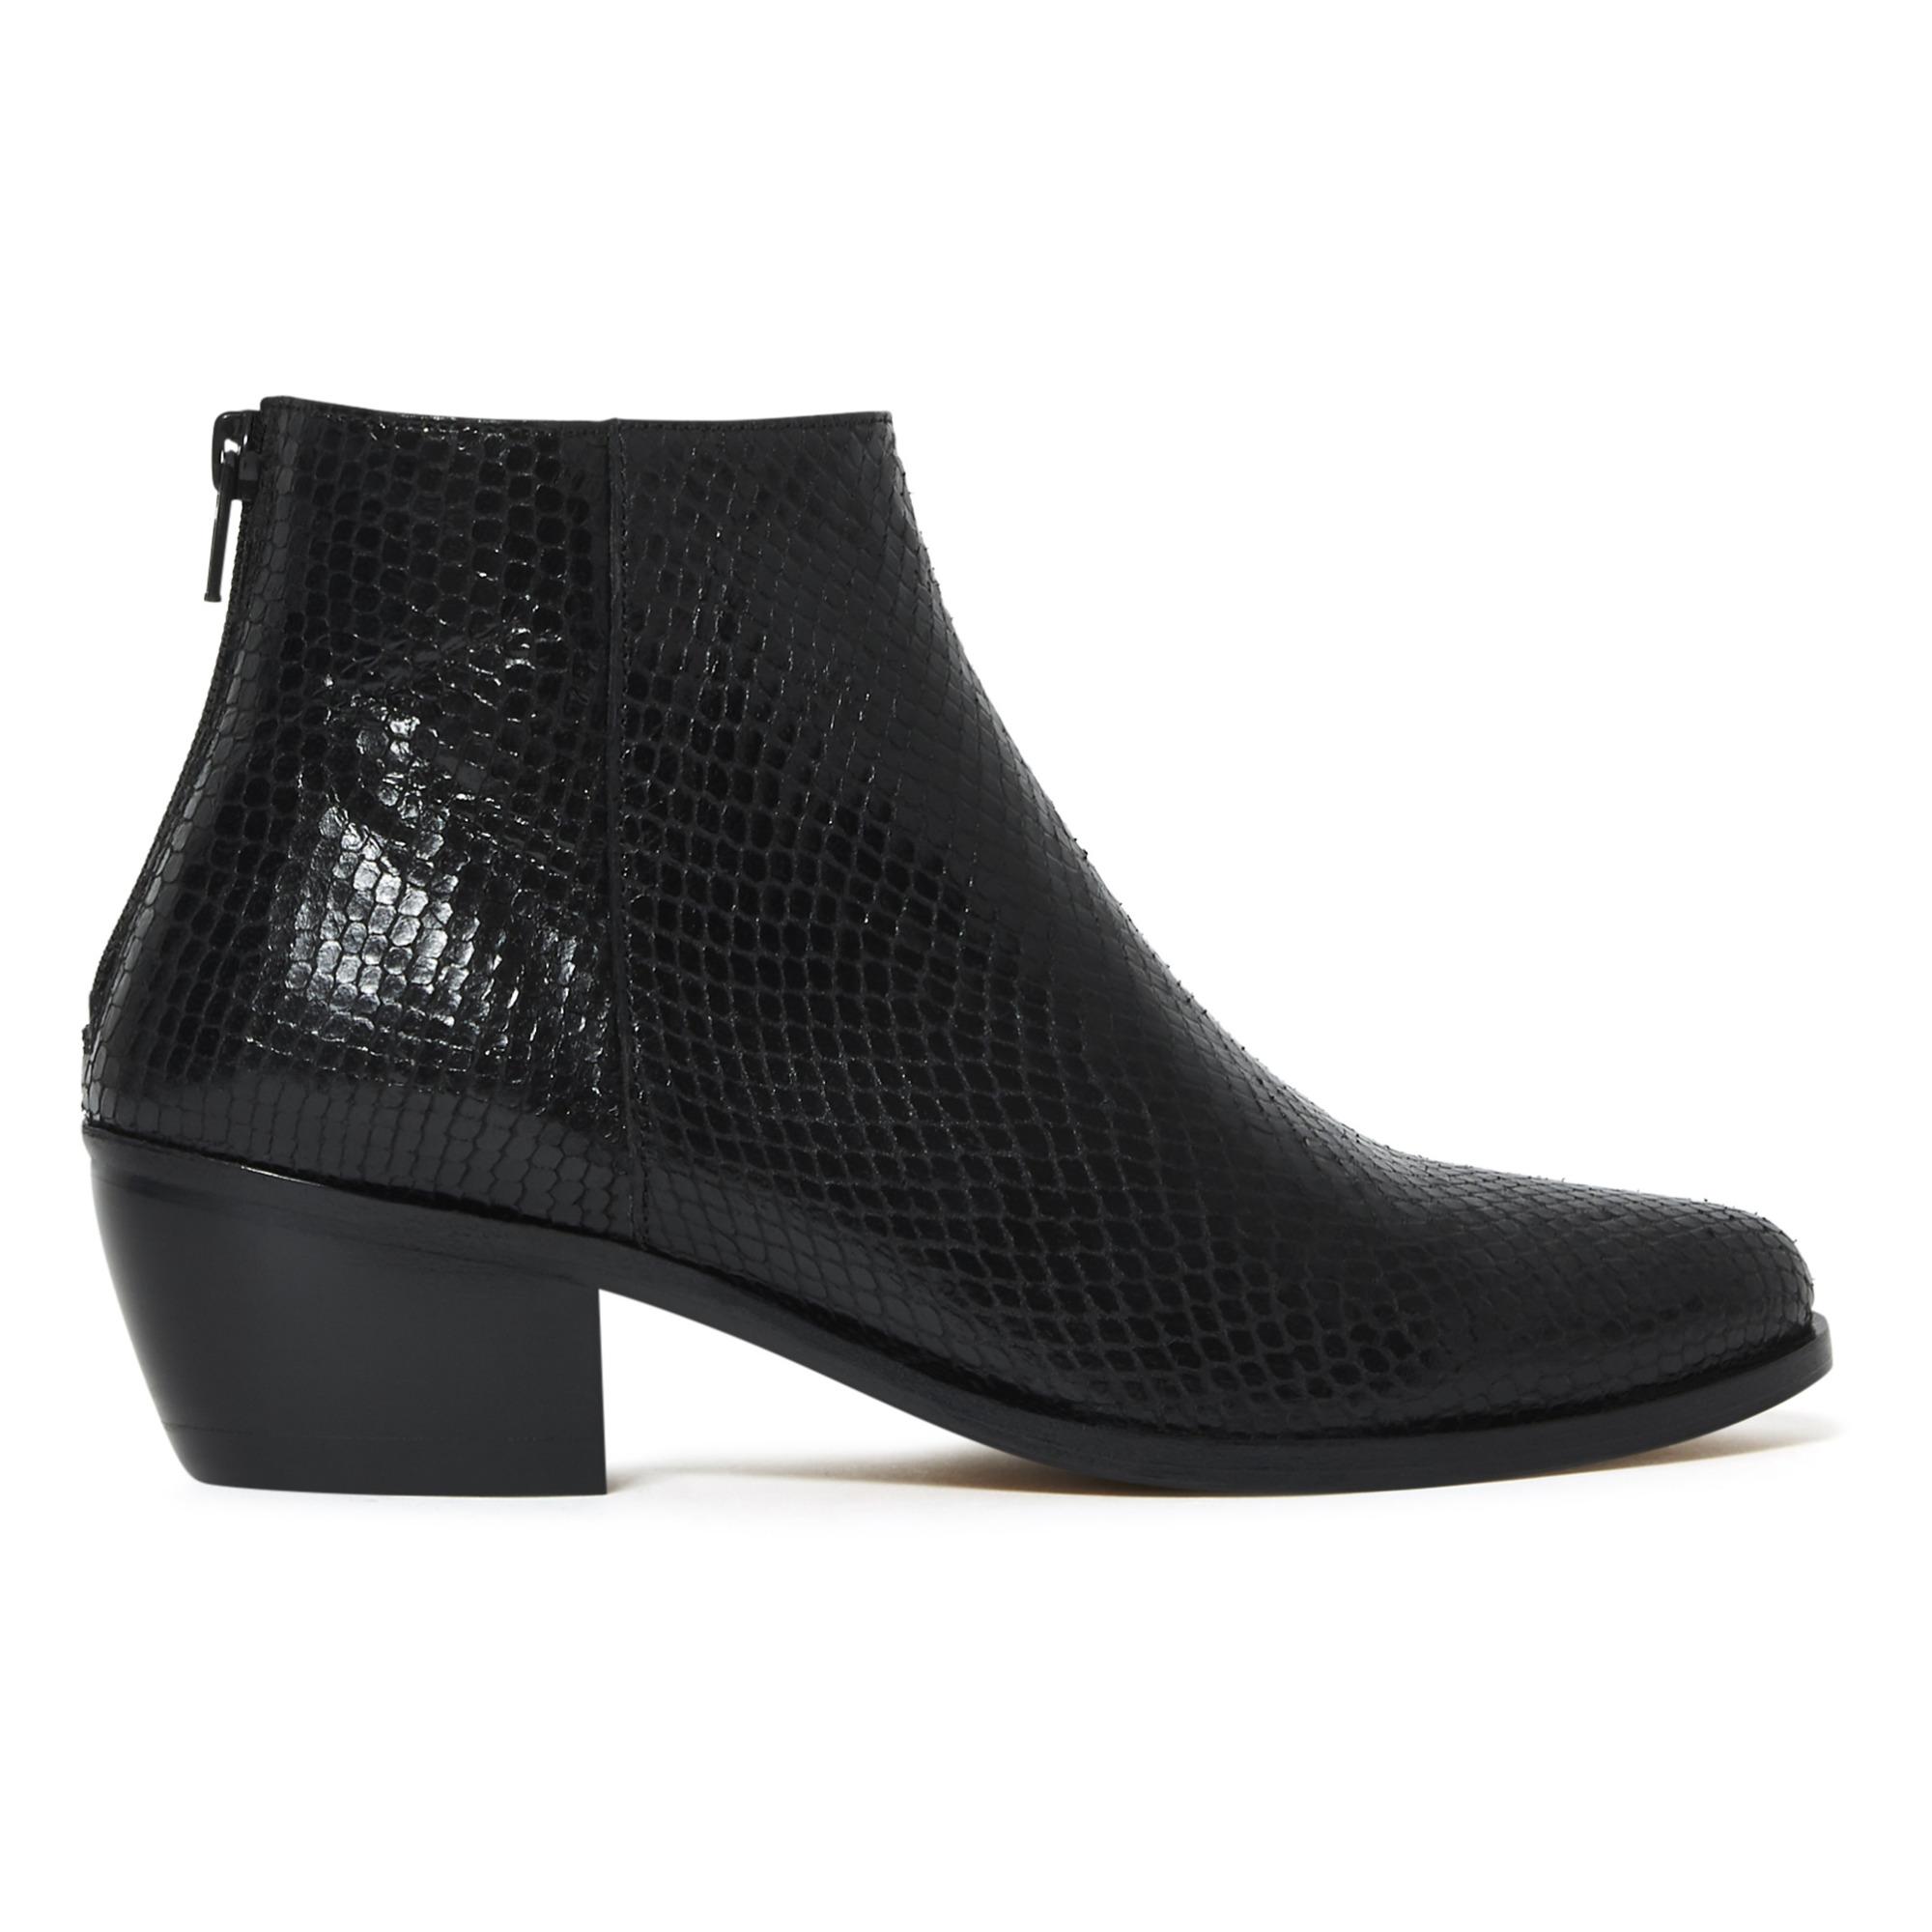 Telma Leather Snakeskin Ankle Boots